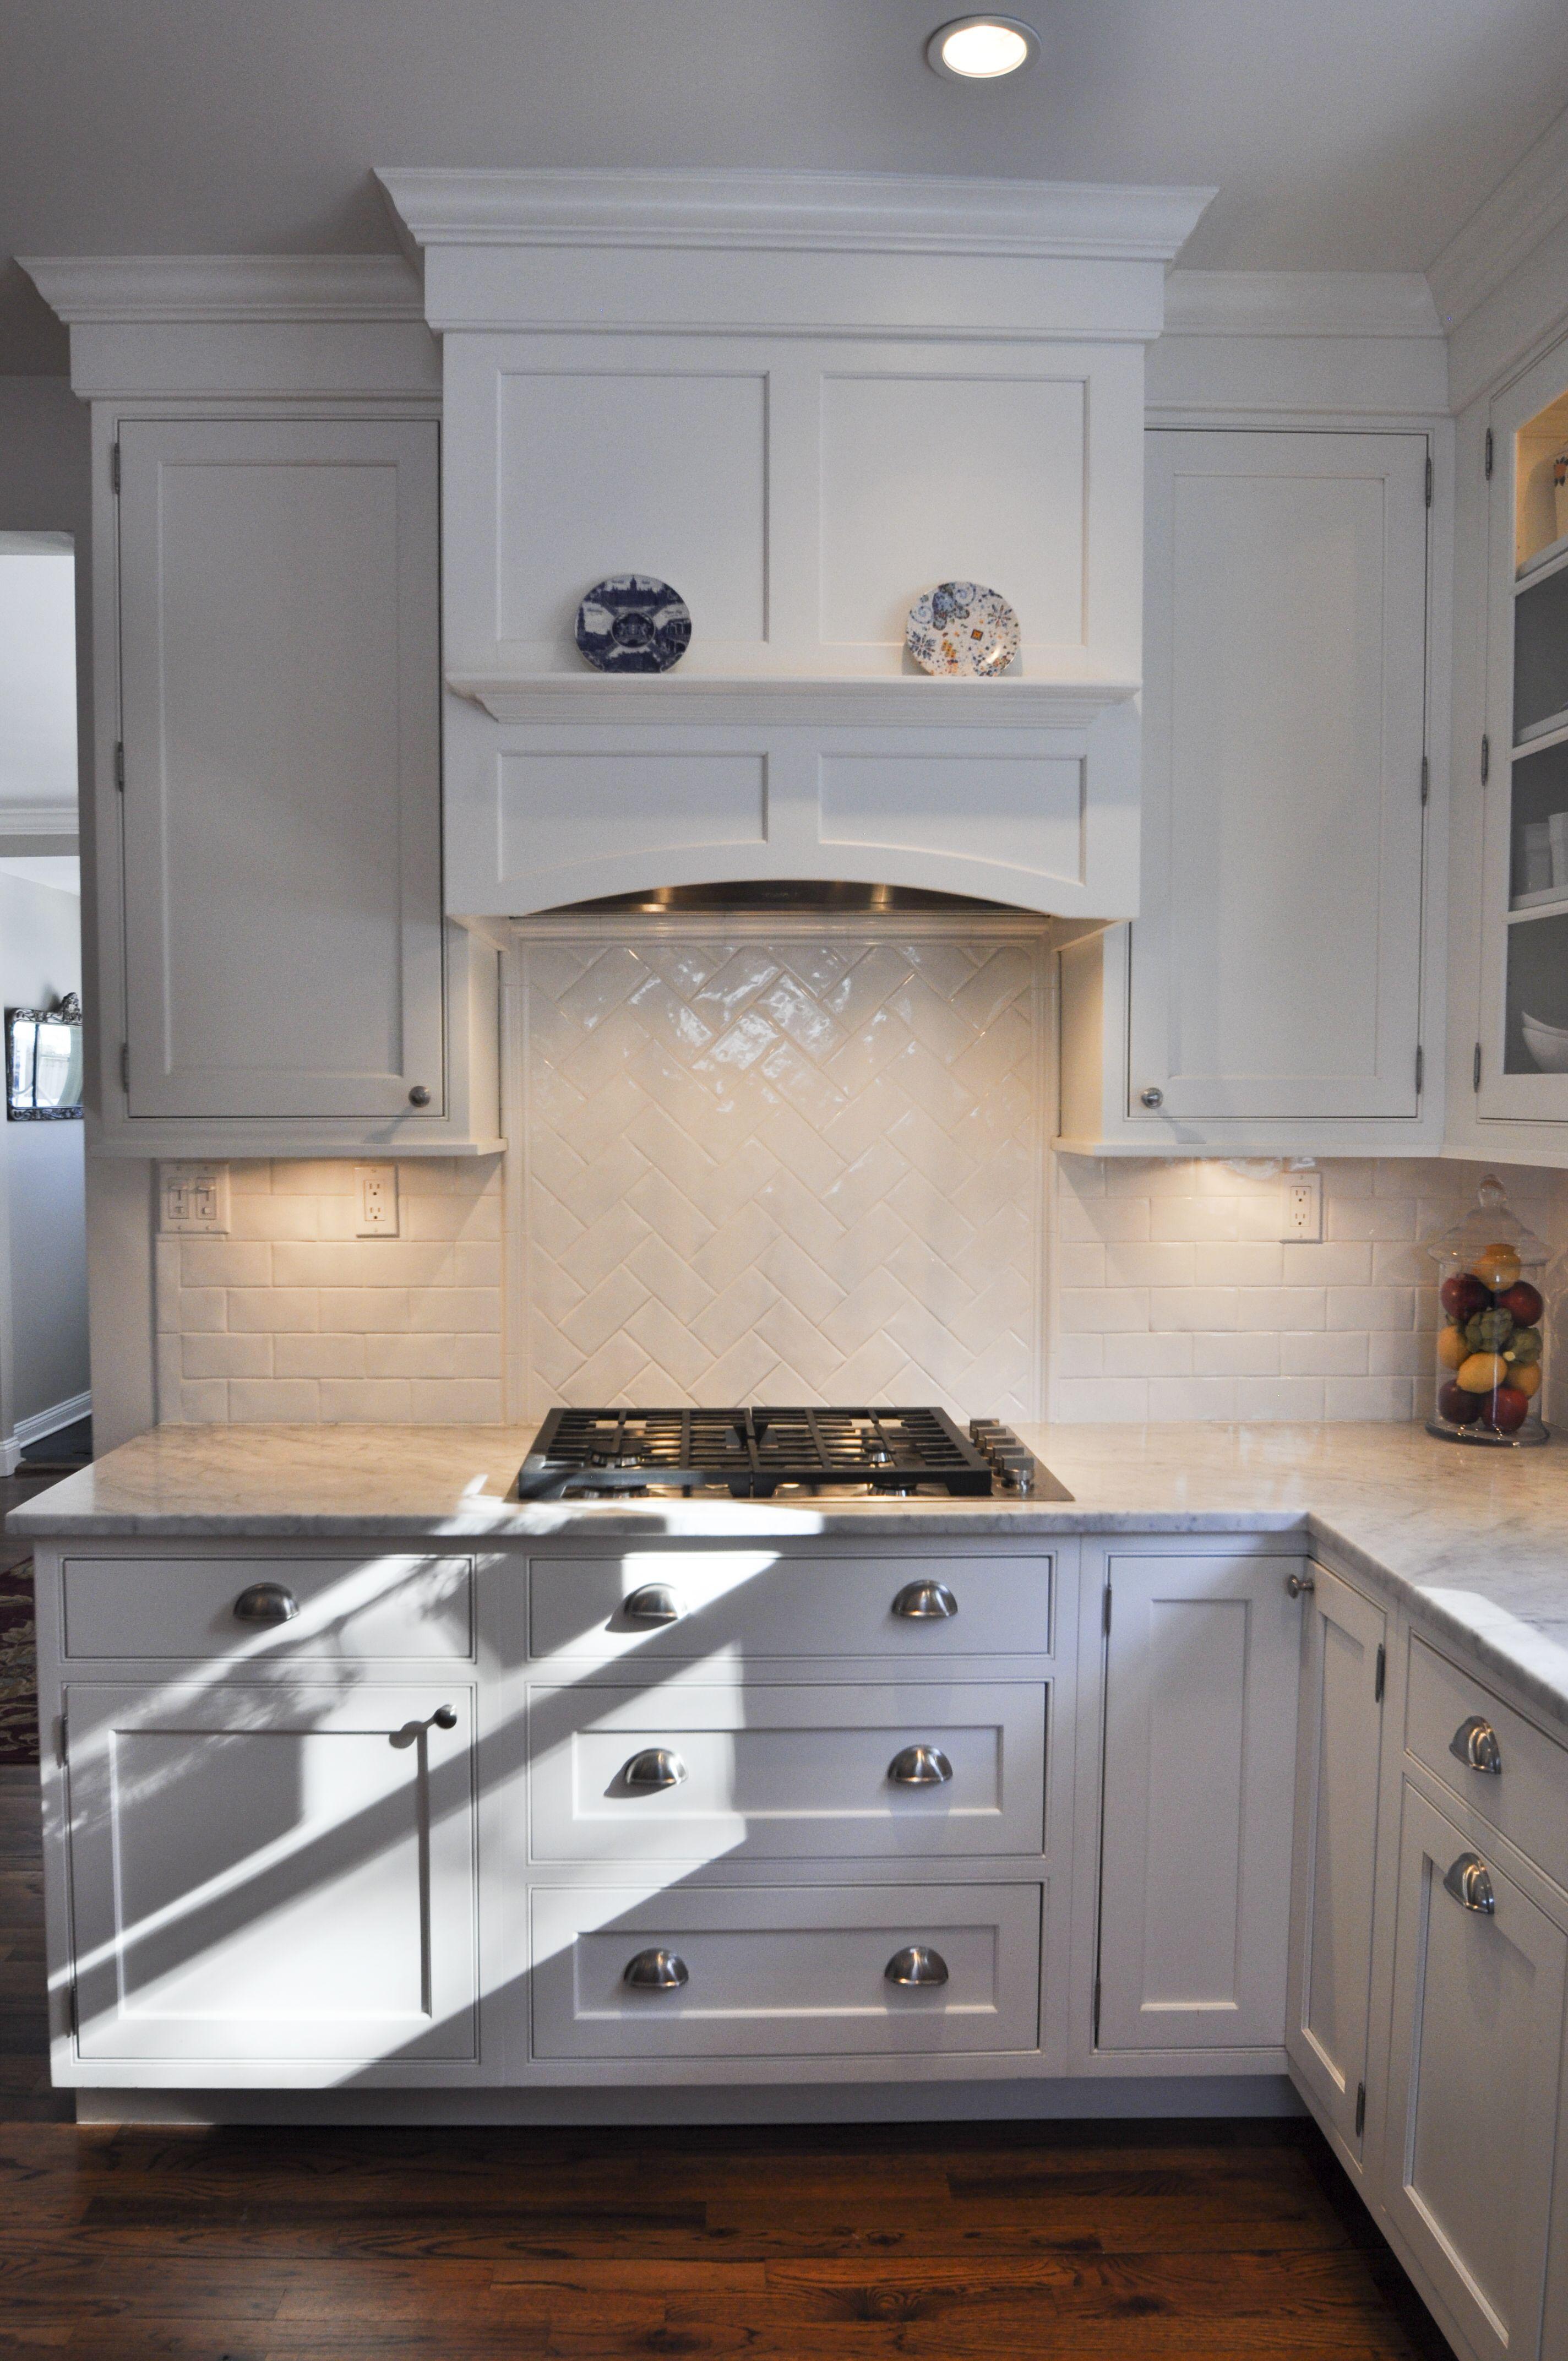 Kitchens Kitchen Backsplash Trends Kitchen Inspirations